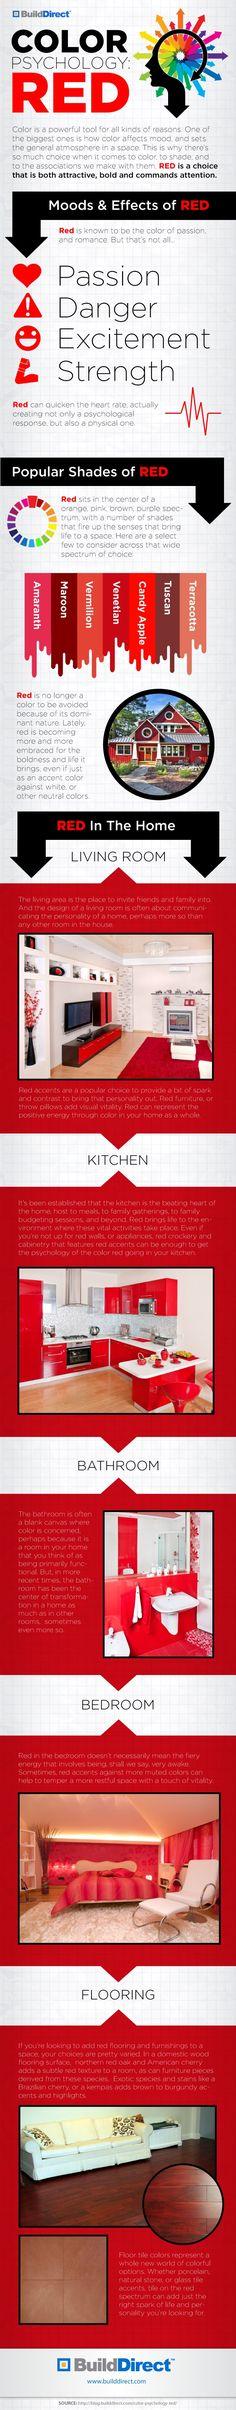 Color Psychology Red copy Emotional Interior Design: Using Red